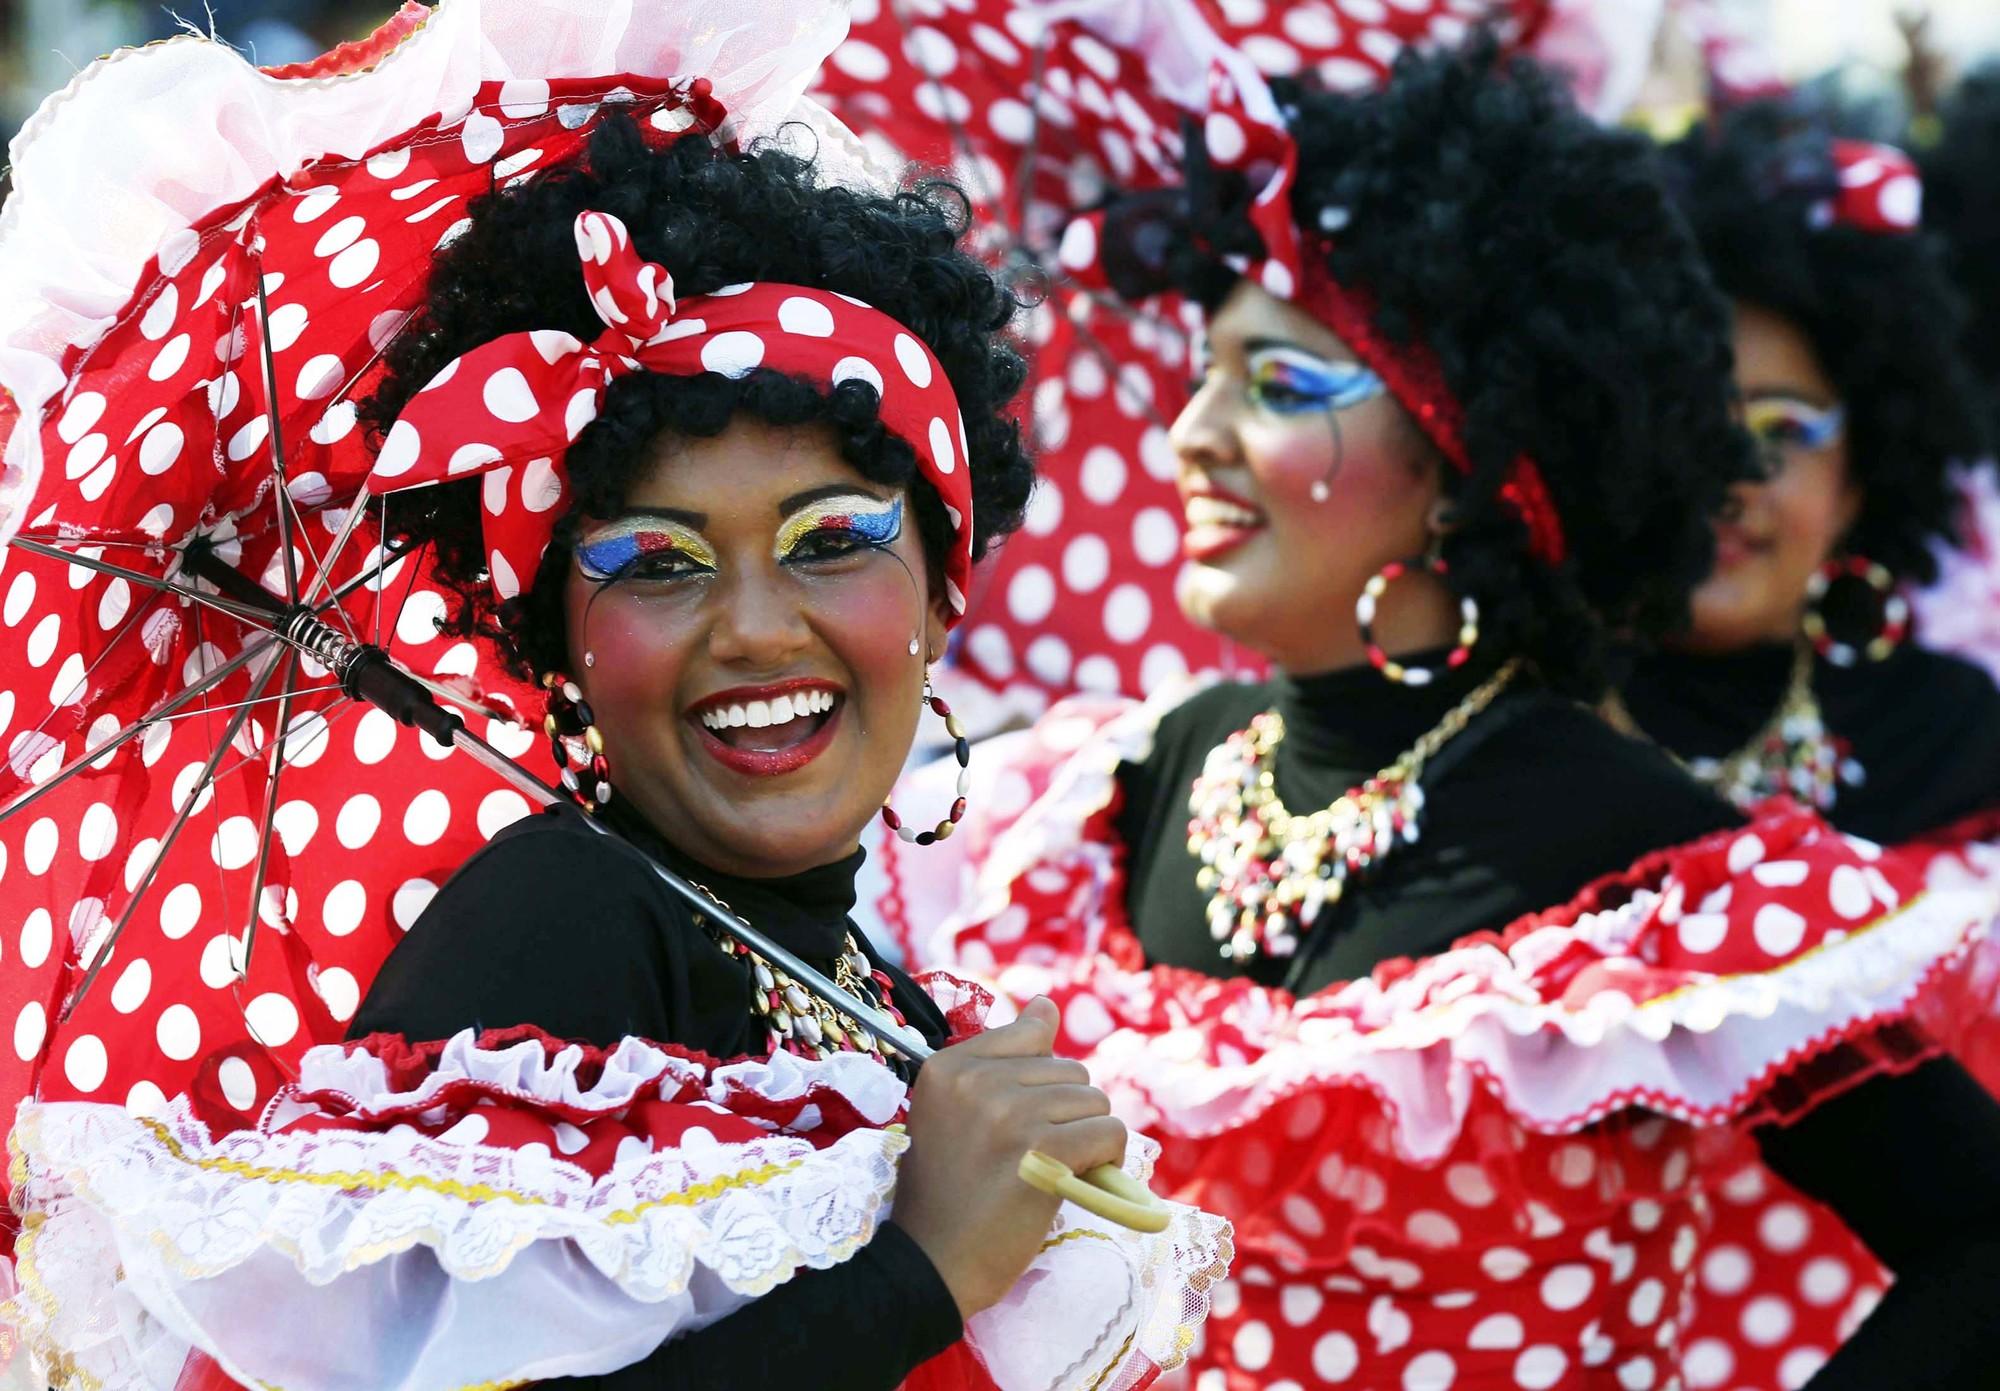 Lors du carnaval de Barranquilla, en Colombie.